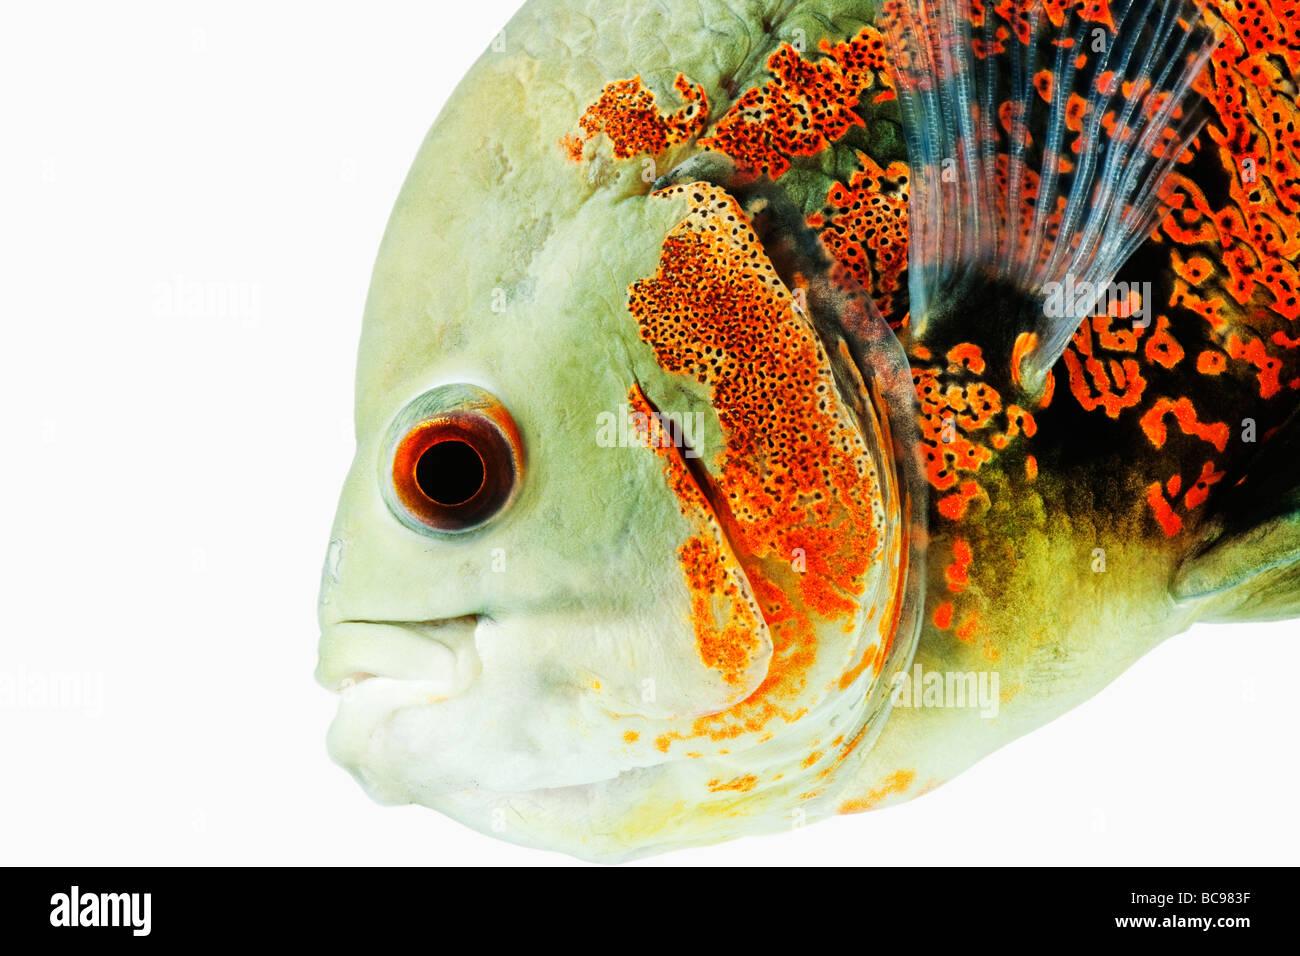 Oscar Astonotus Ocellatus tropischen Süßwasser Fisch Dist Brasilien Französisch Guinea Kolumbien Stockbild